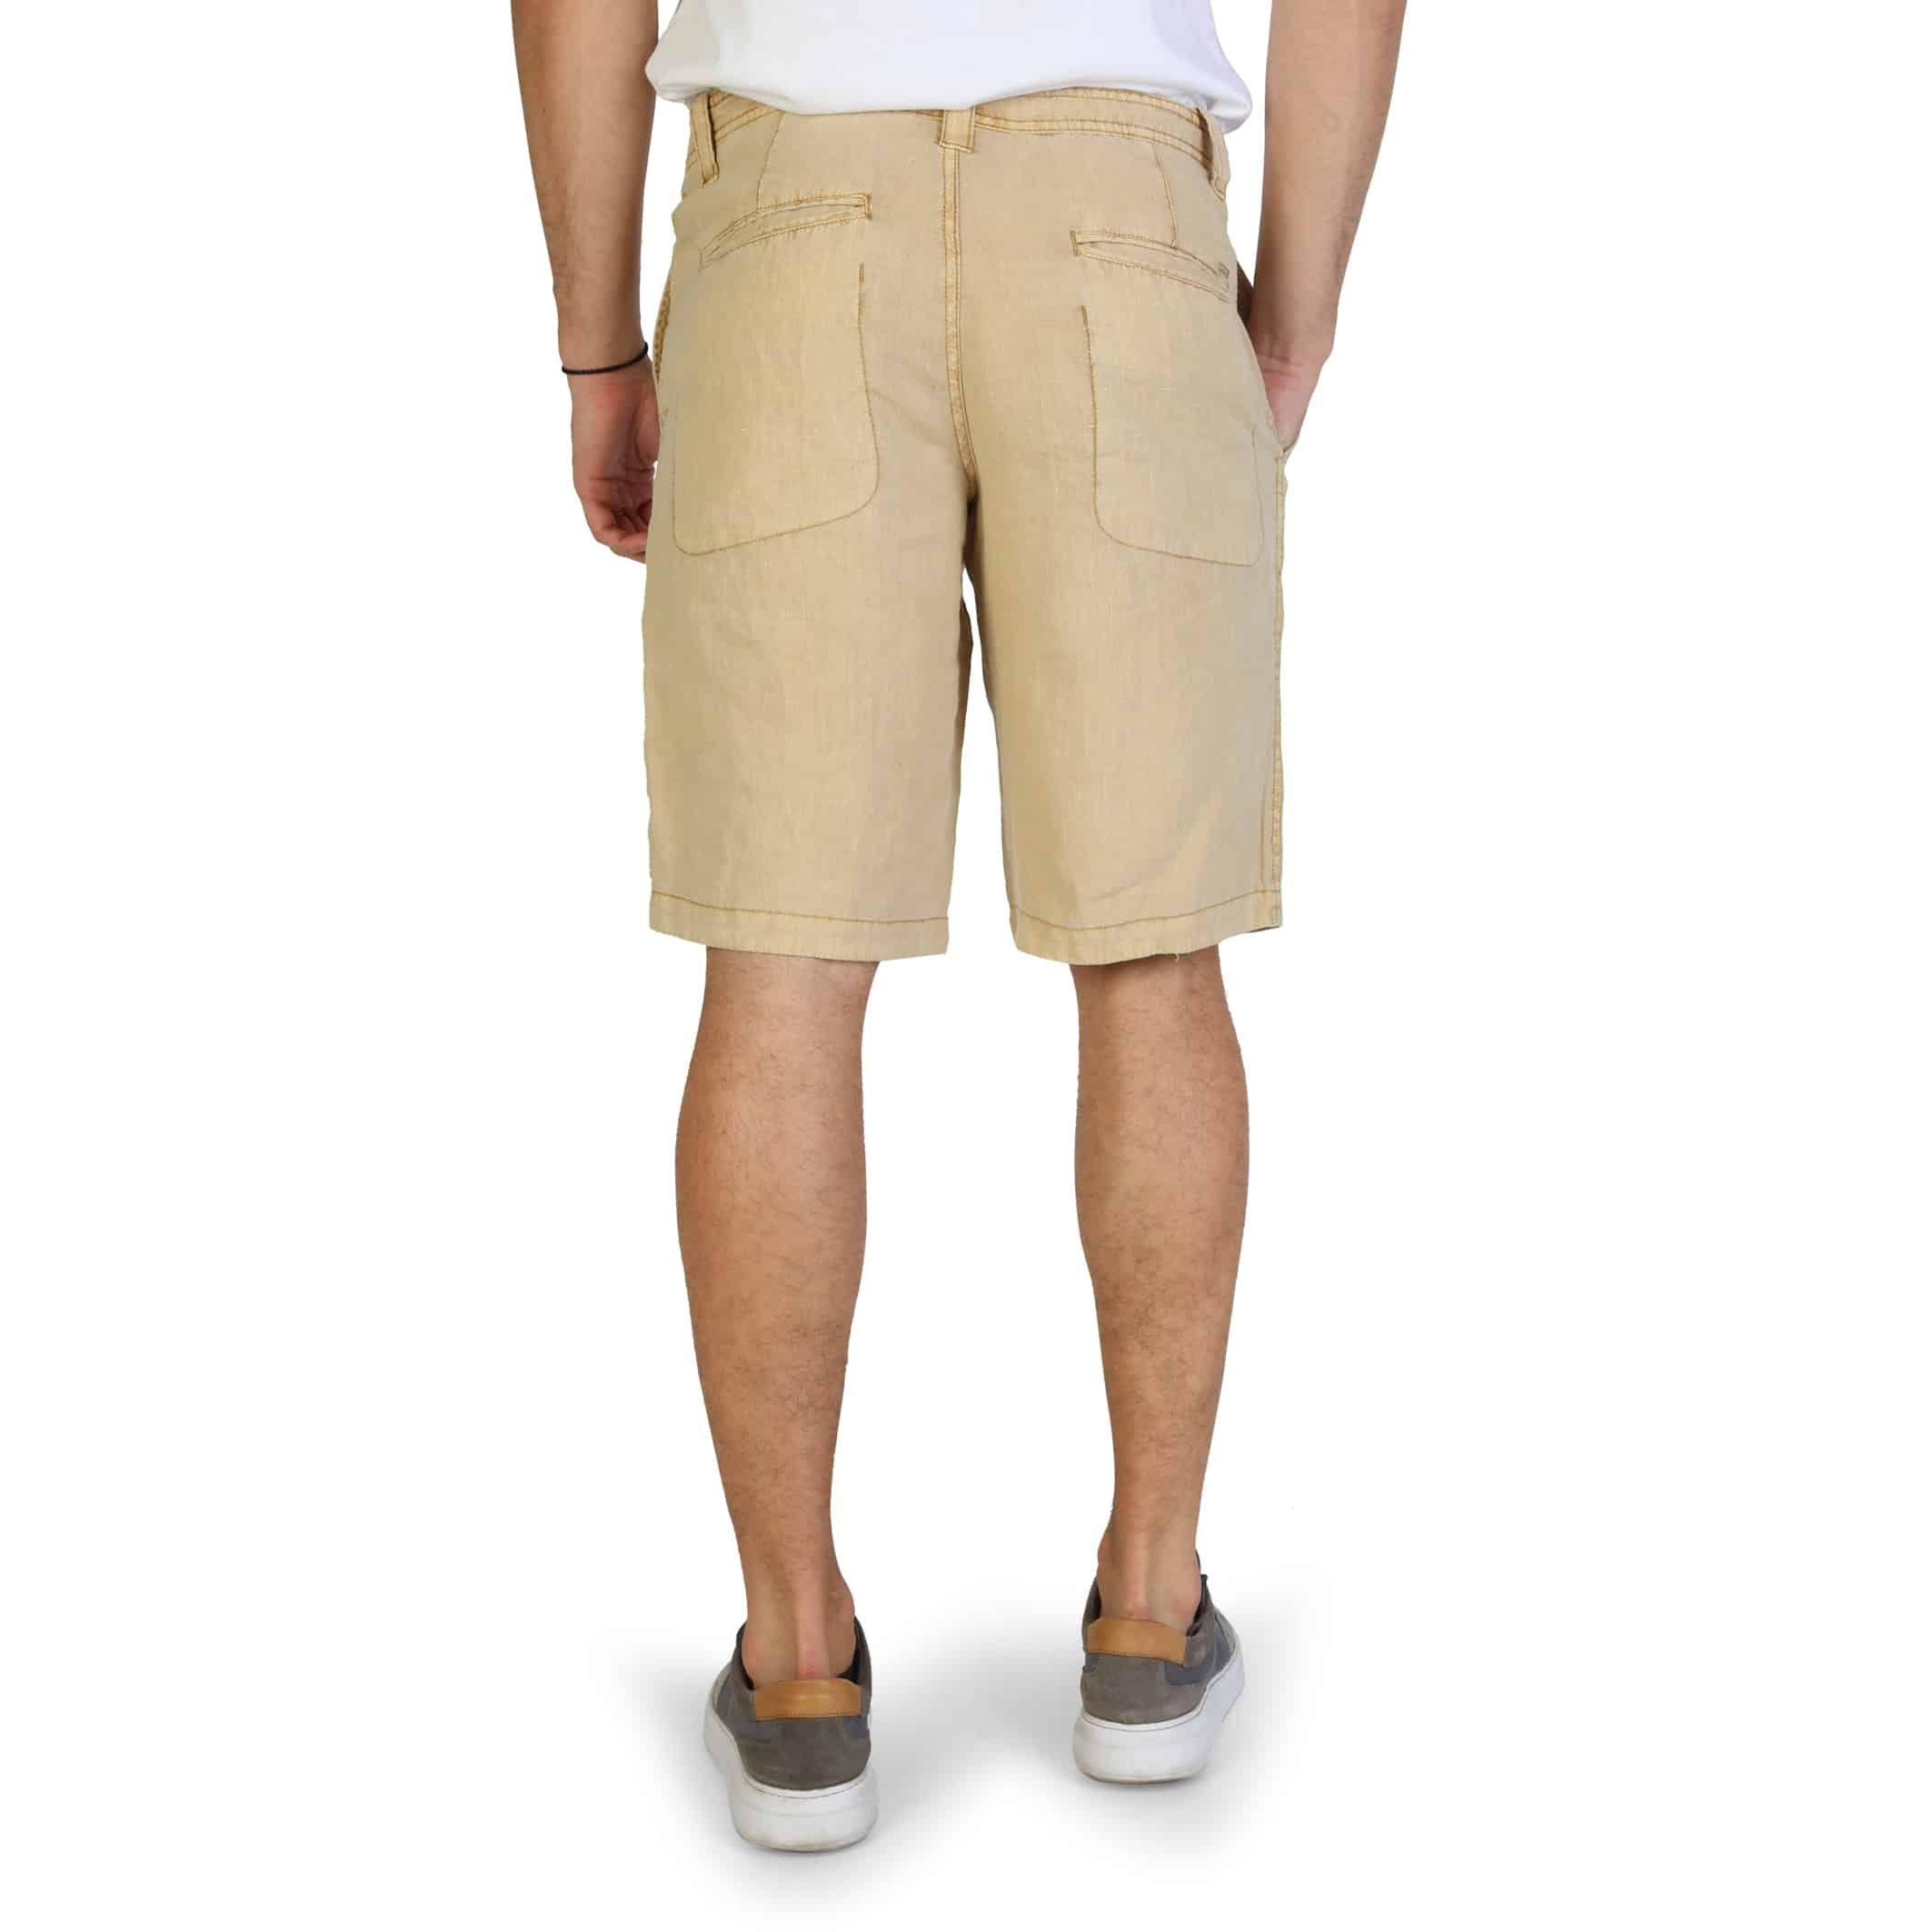 Armani Jeans – 3Y6S75_6NDMZ – Marrone